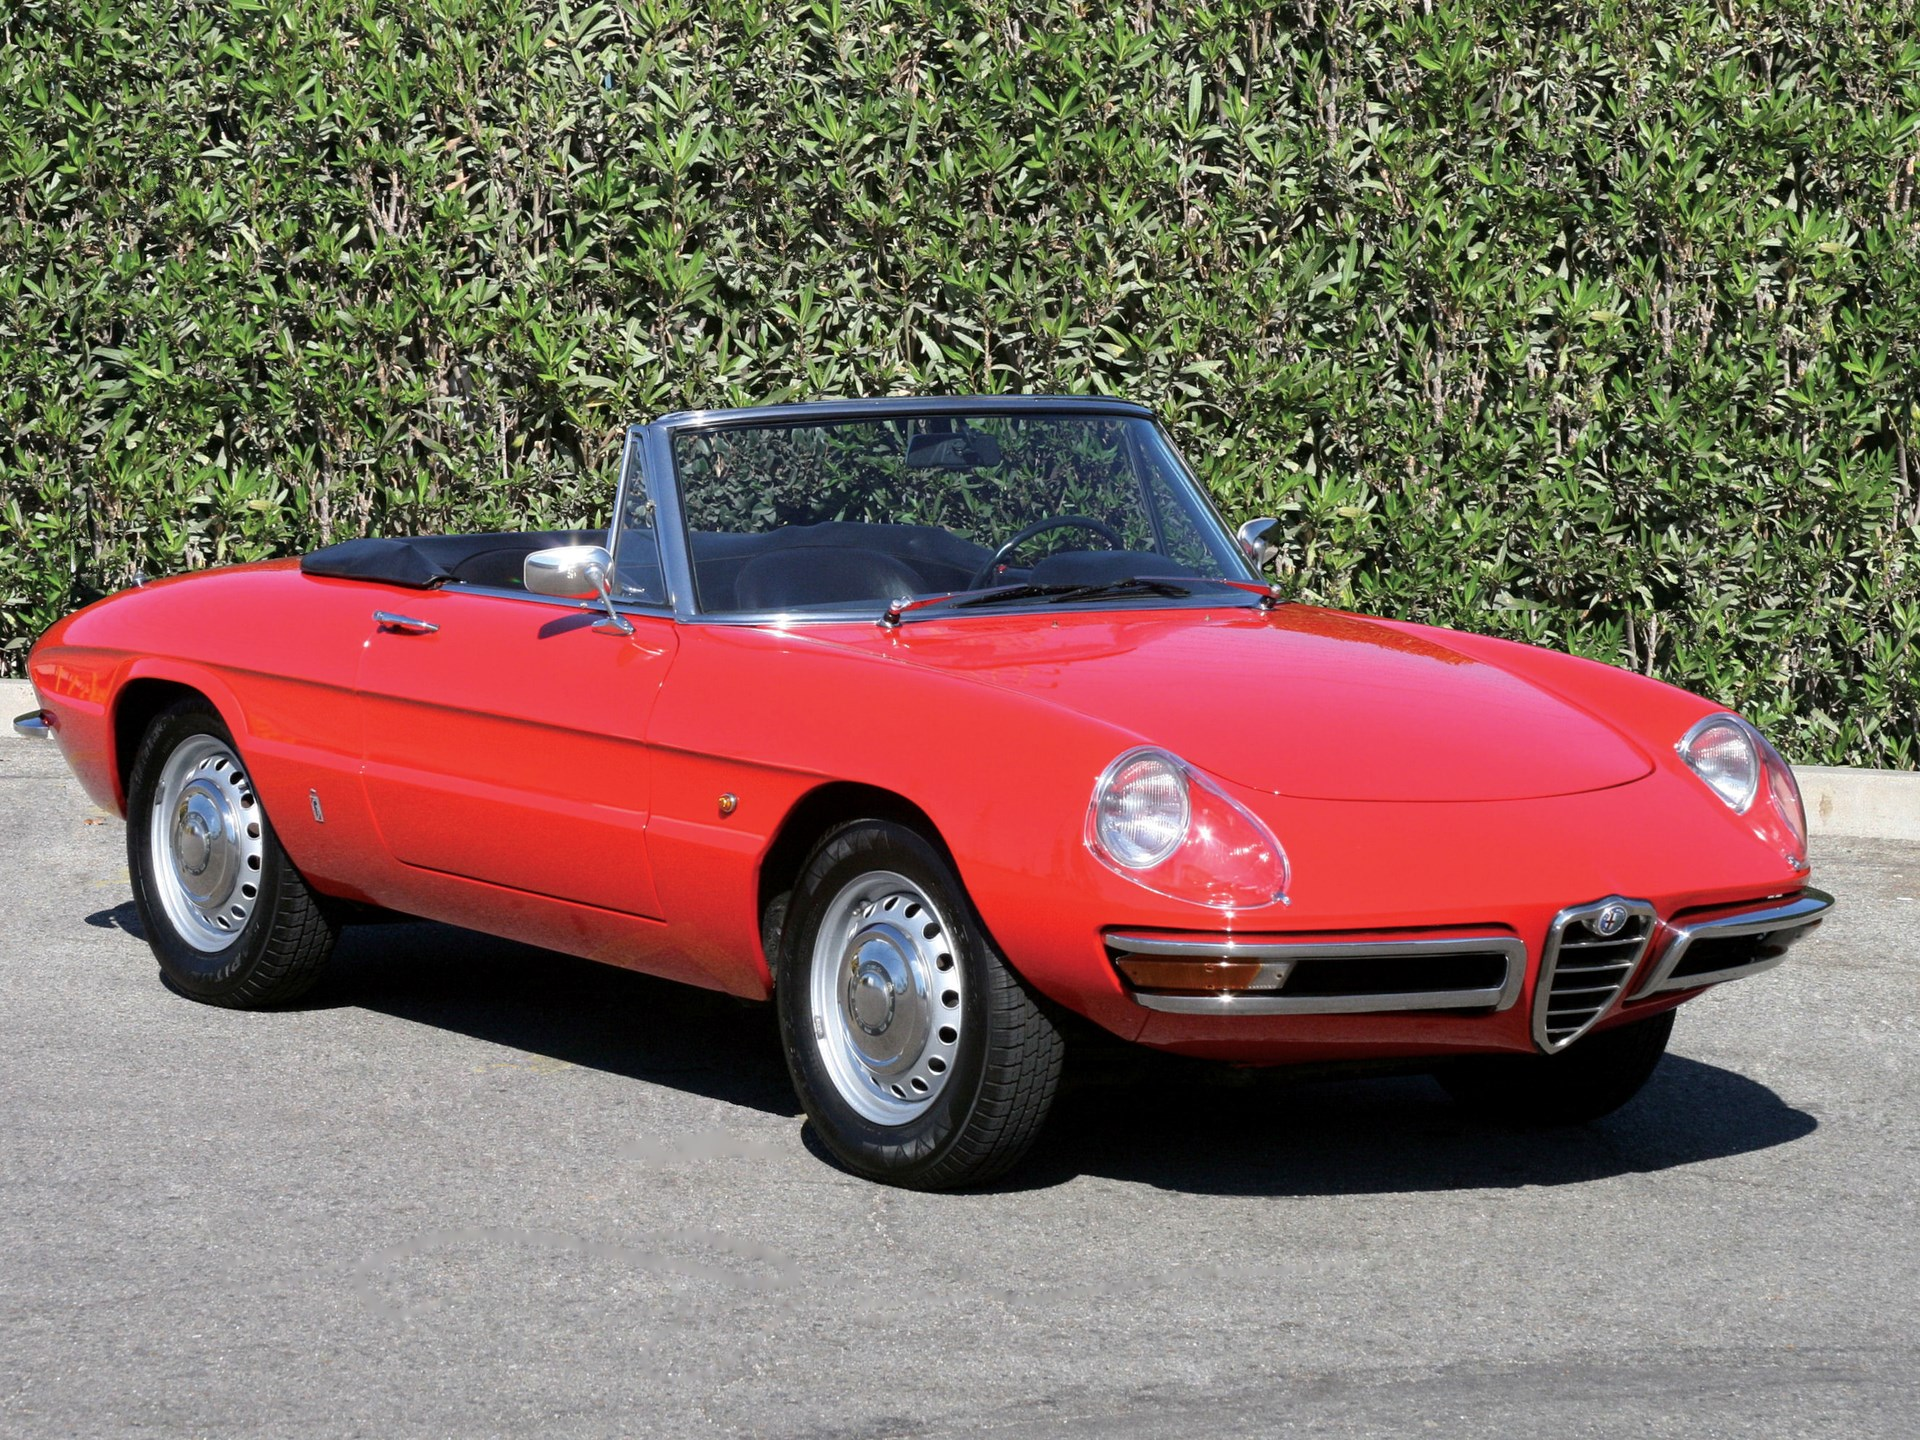 RM Sothebys Alfa Romeo Duetto Spider Automobiles Of - 1967 alfa romeo duetto spider for sale